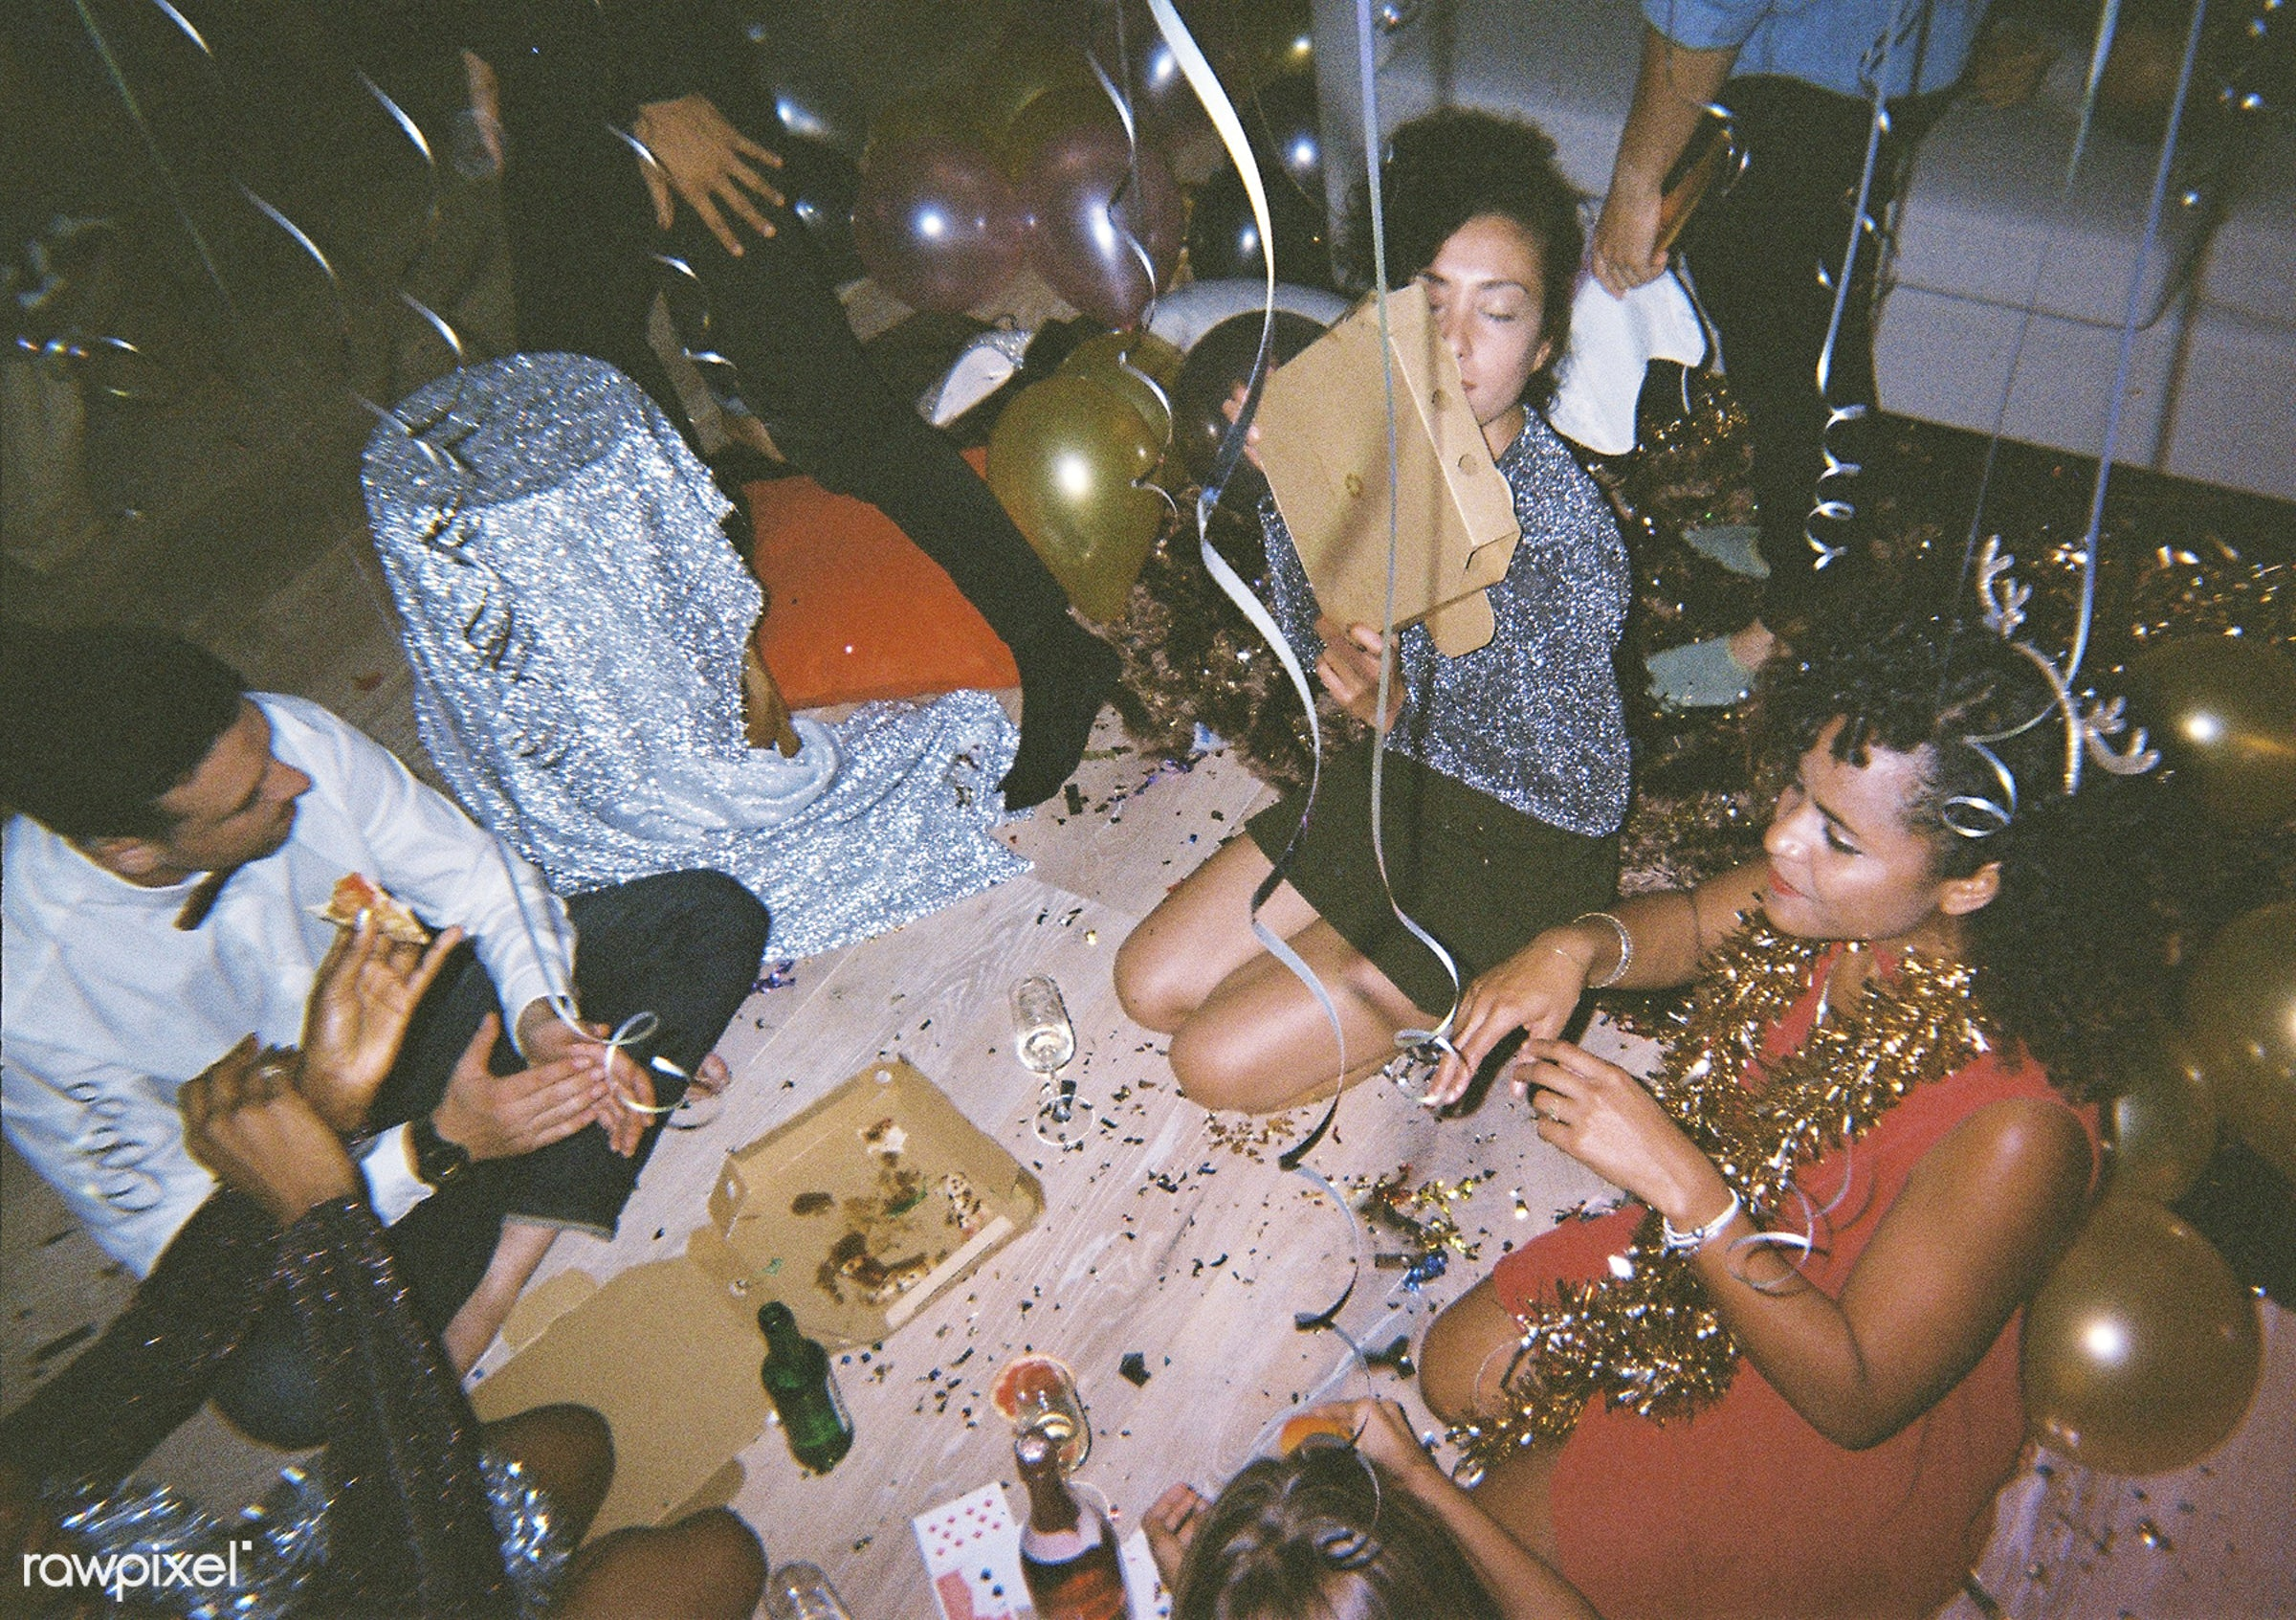 People enjoying a party - 2018, balloons, birthday, birthday party, caucasian, celebrate, celebration, diverse, festive,...